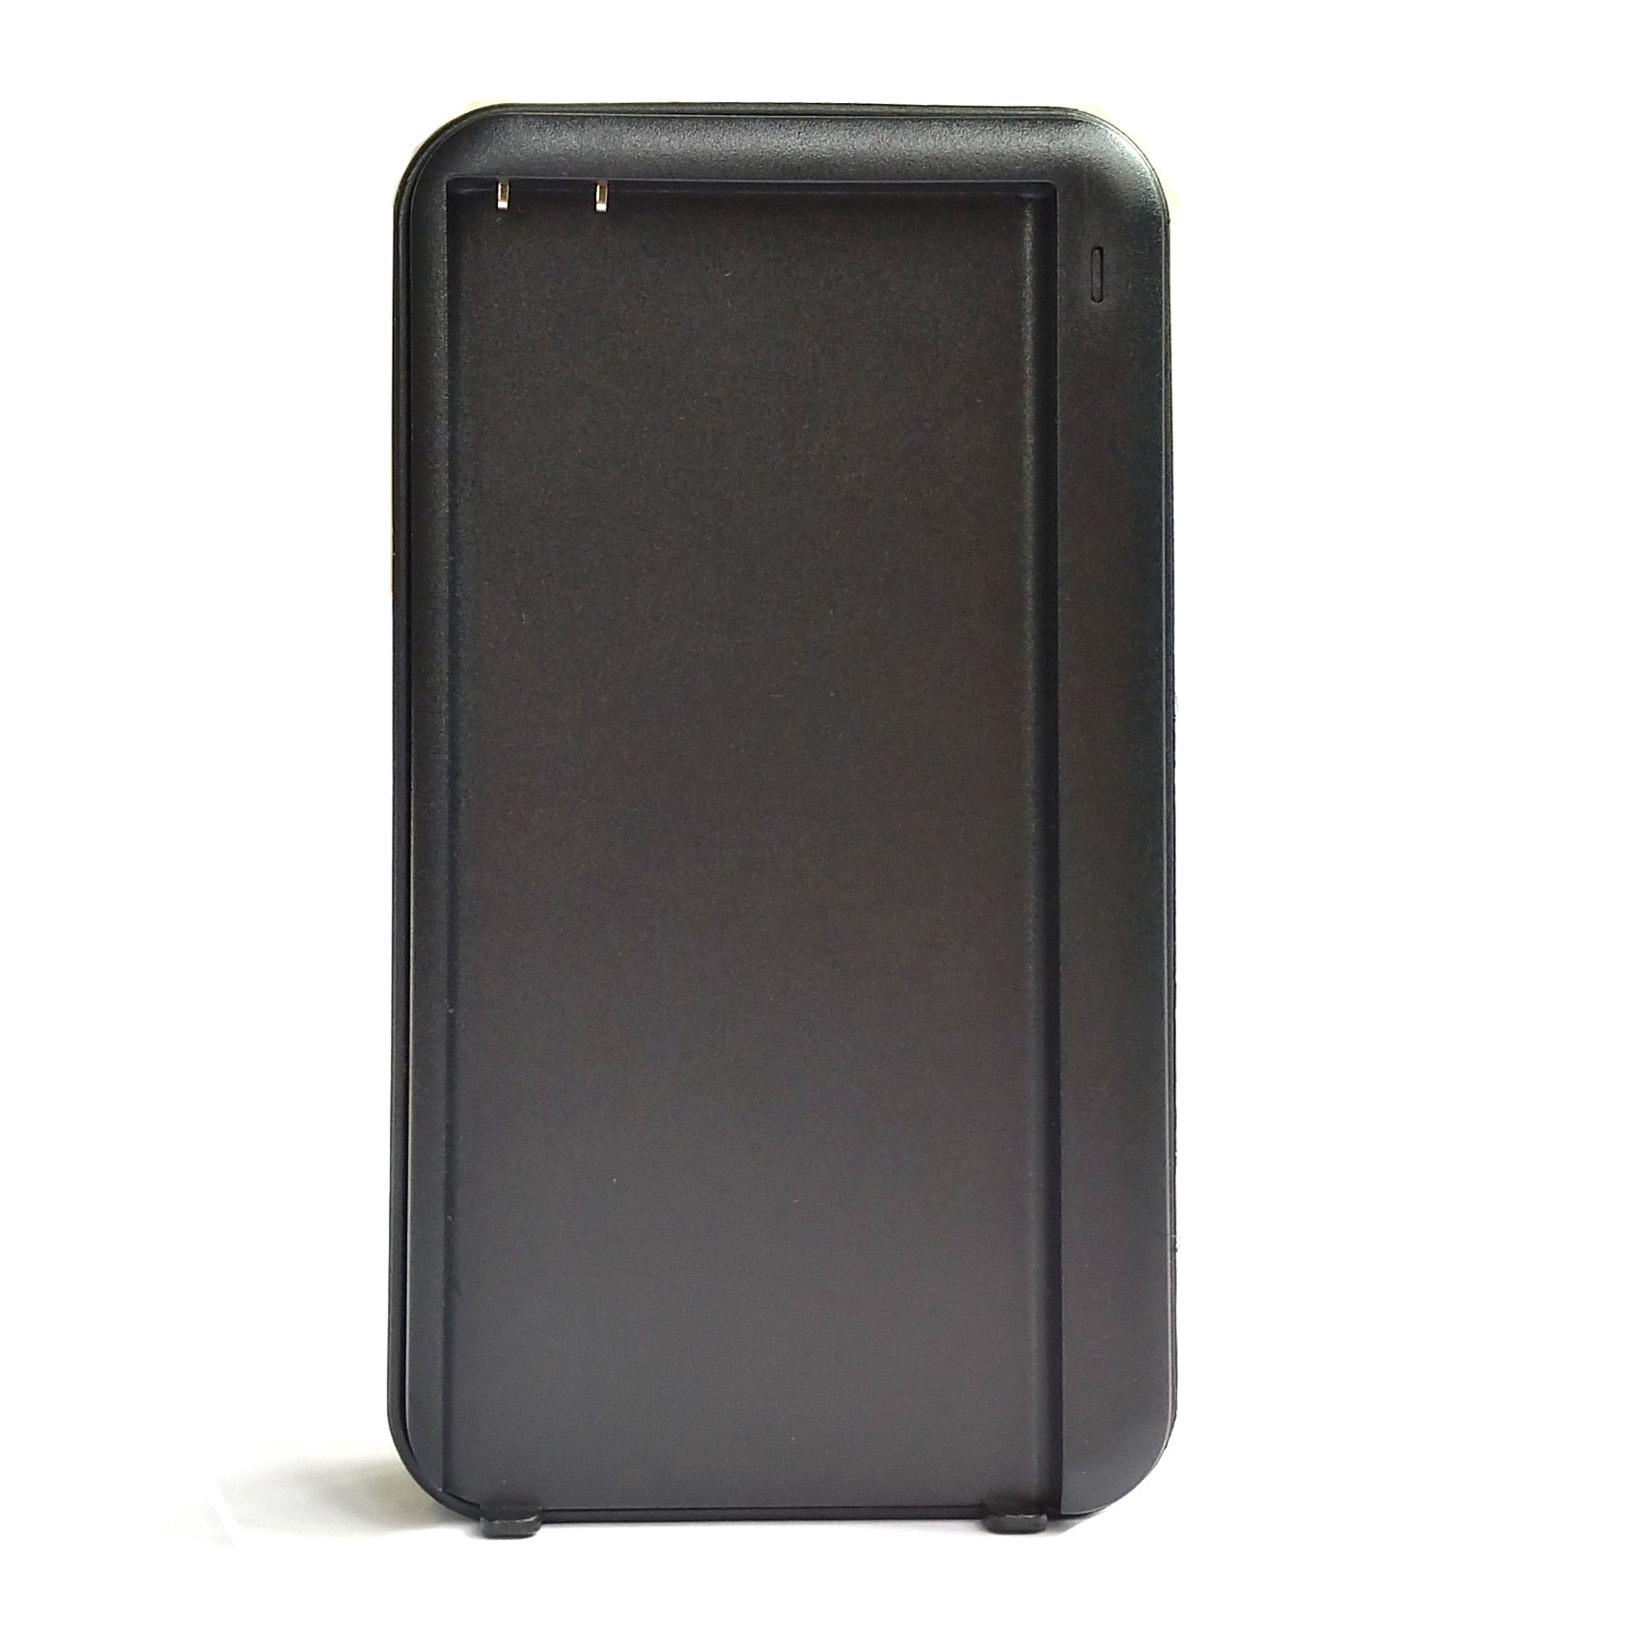 壹博源适LG G5手机F700H868 H860N H860 H968 H830电池充电器座充